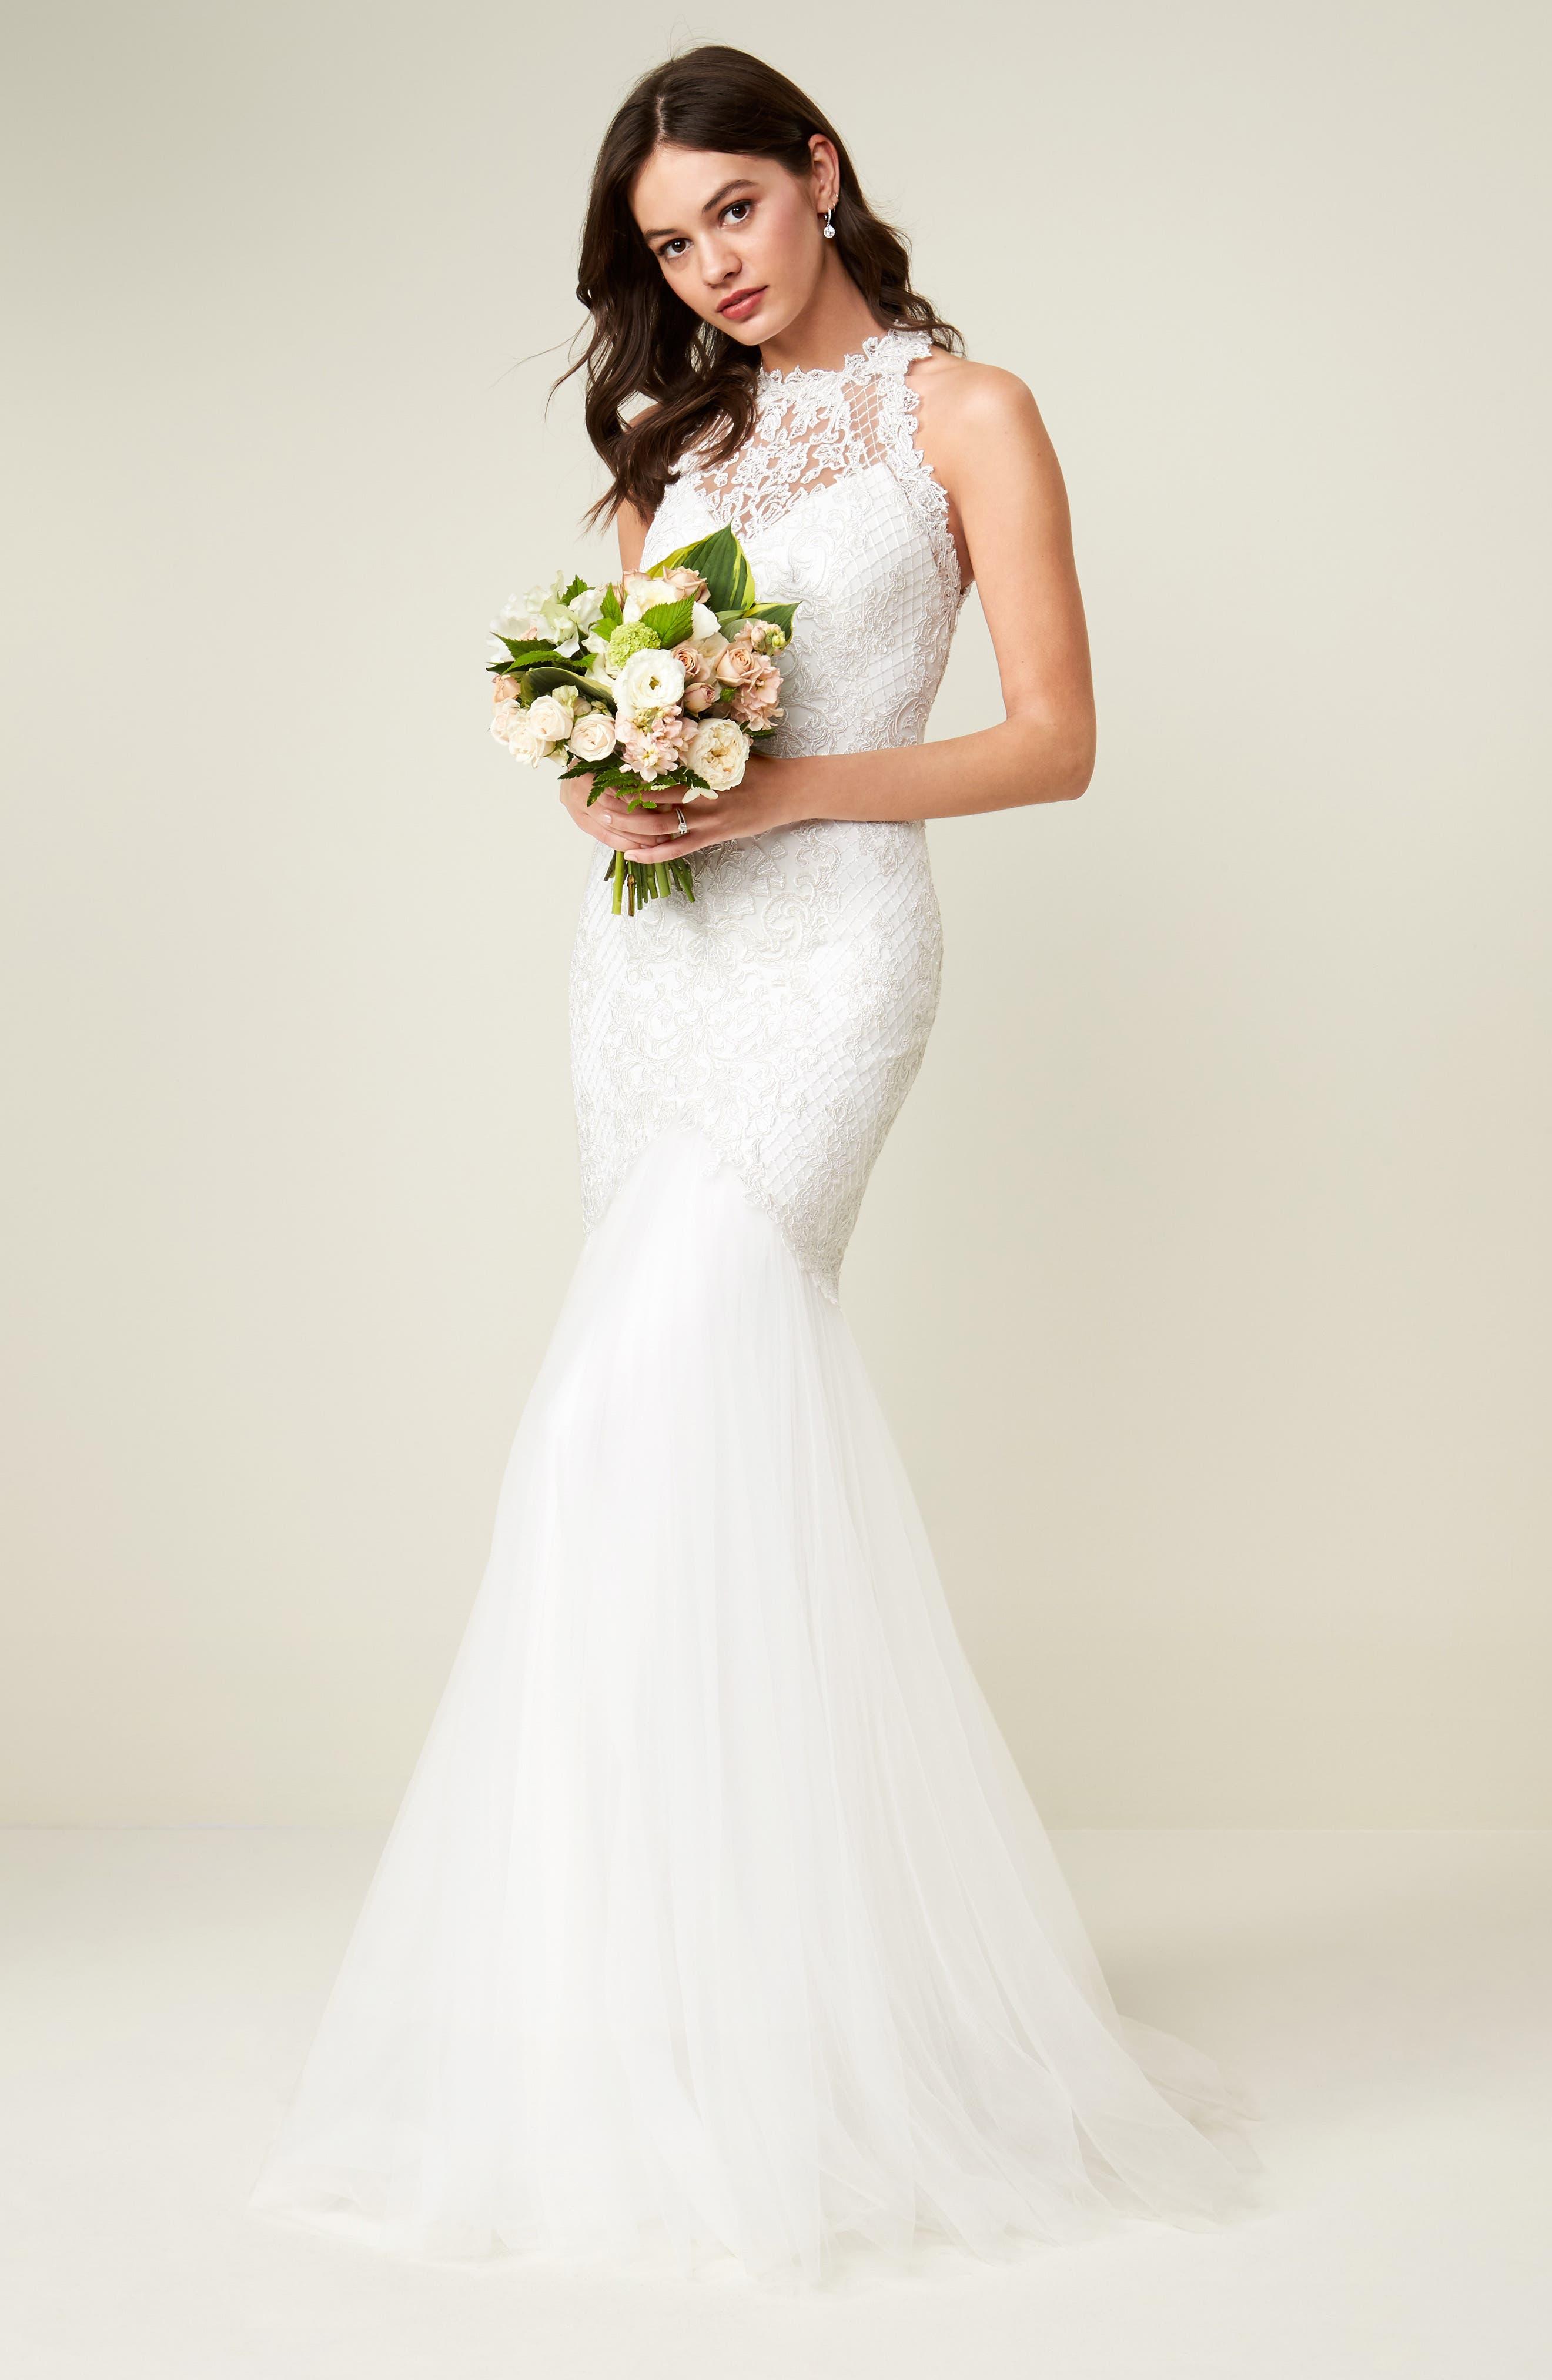 $750 – $1,000 Wedding Dresses & Bridal Gowns | Nordstrom